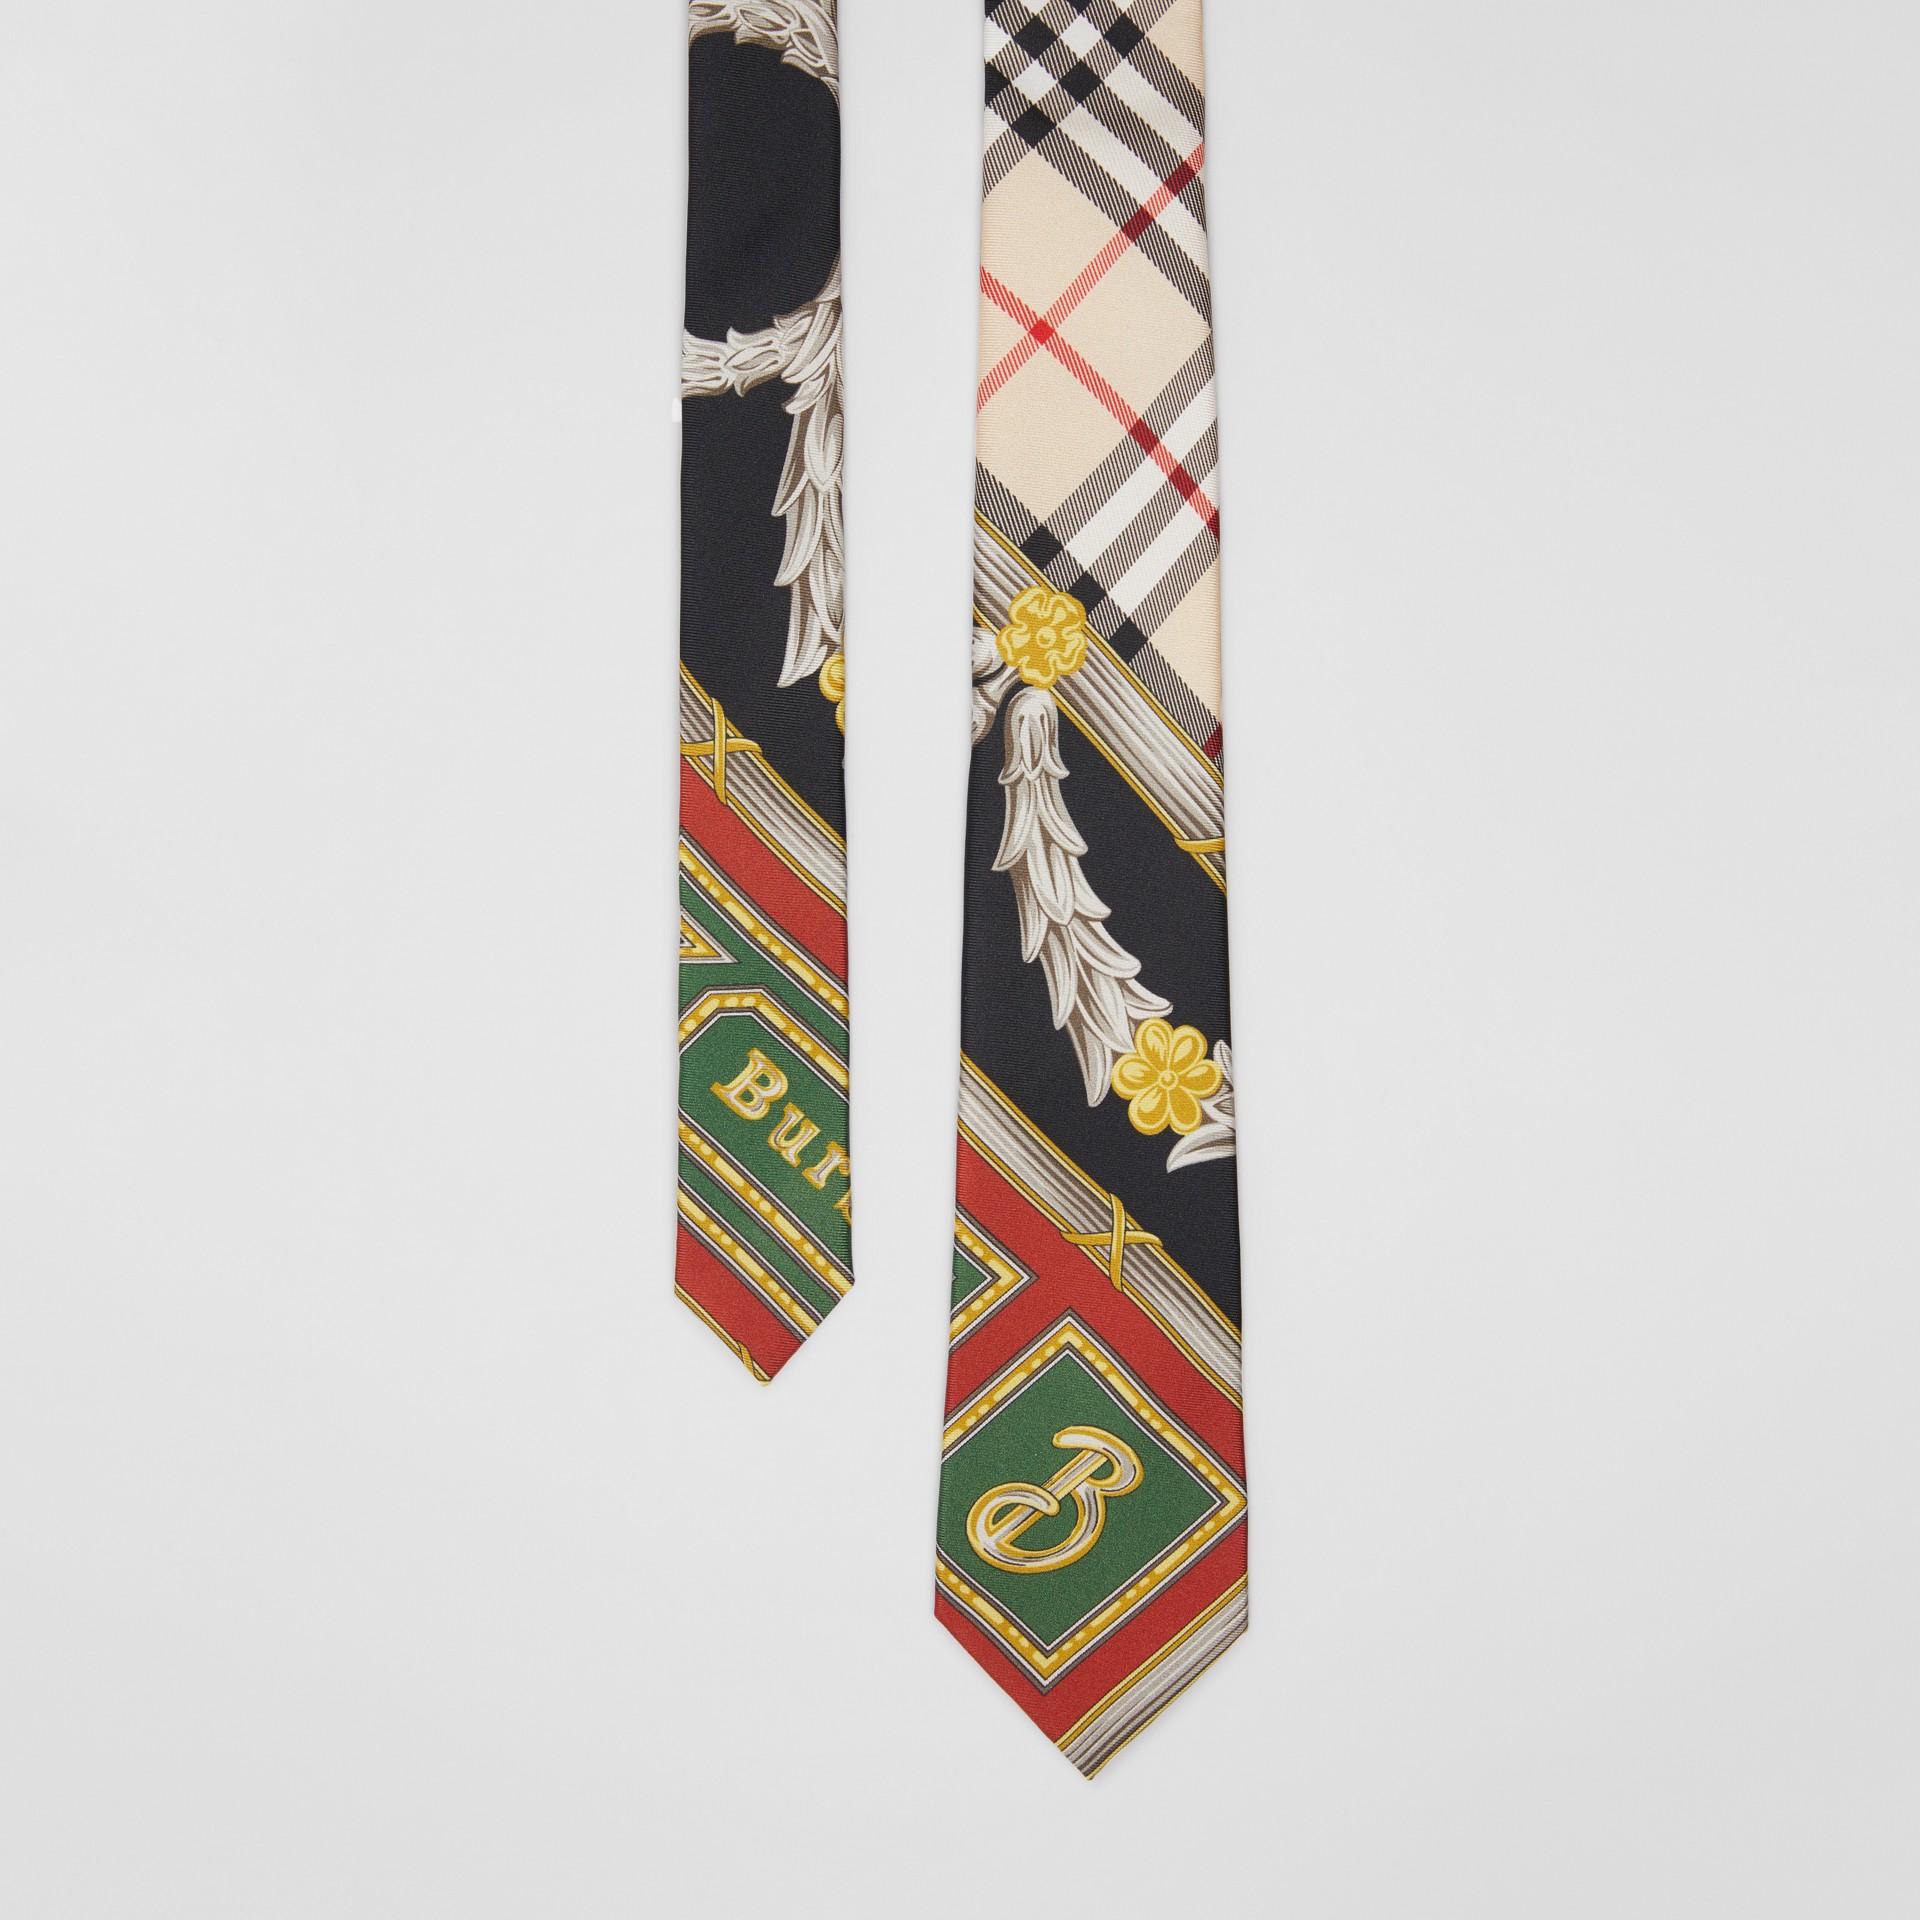 Modern Cut Archive Scarf Print Silk Tie in Dark Green - Men | Burberry United States - gallery image 0